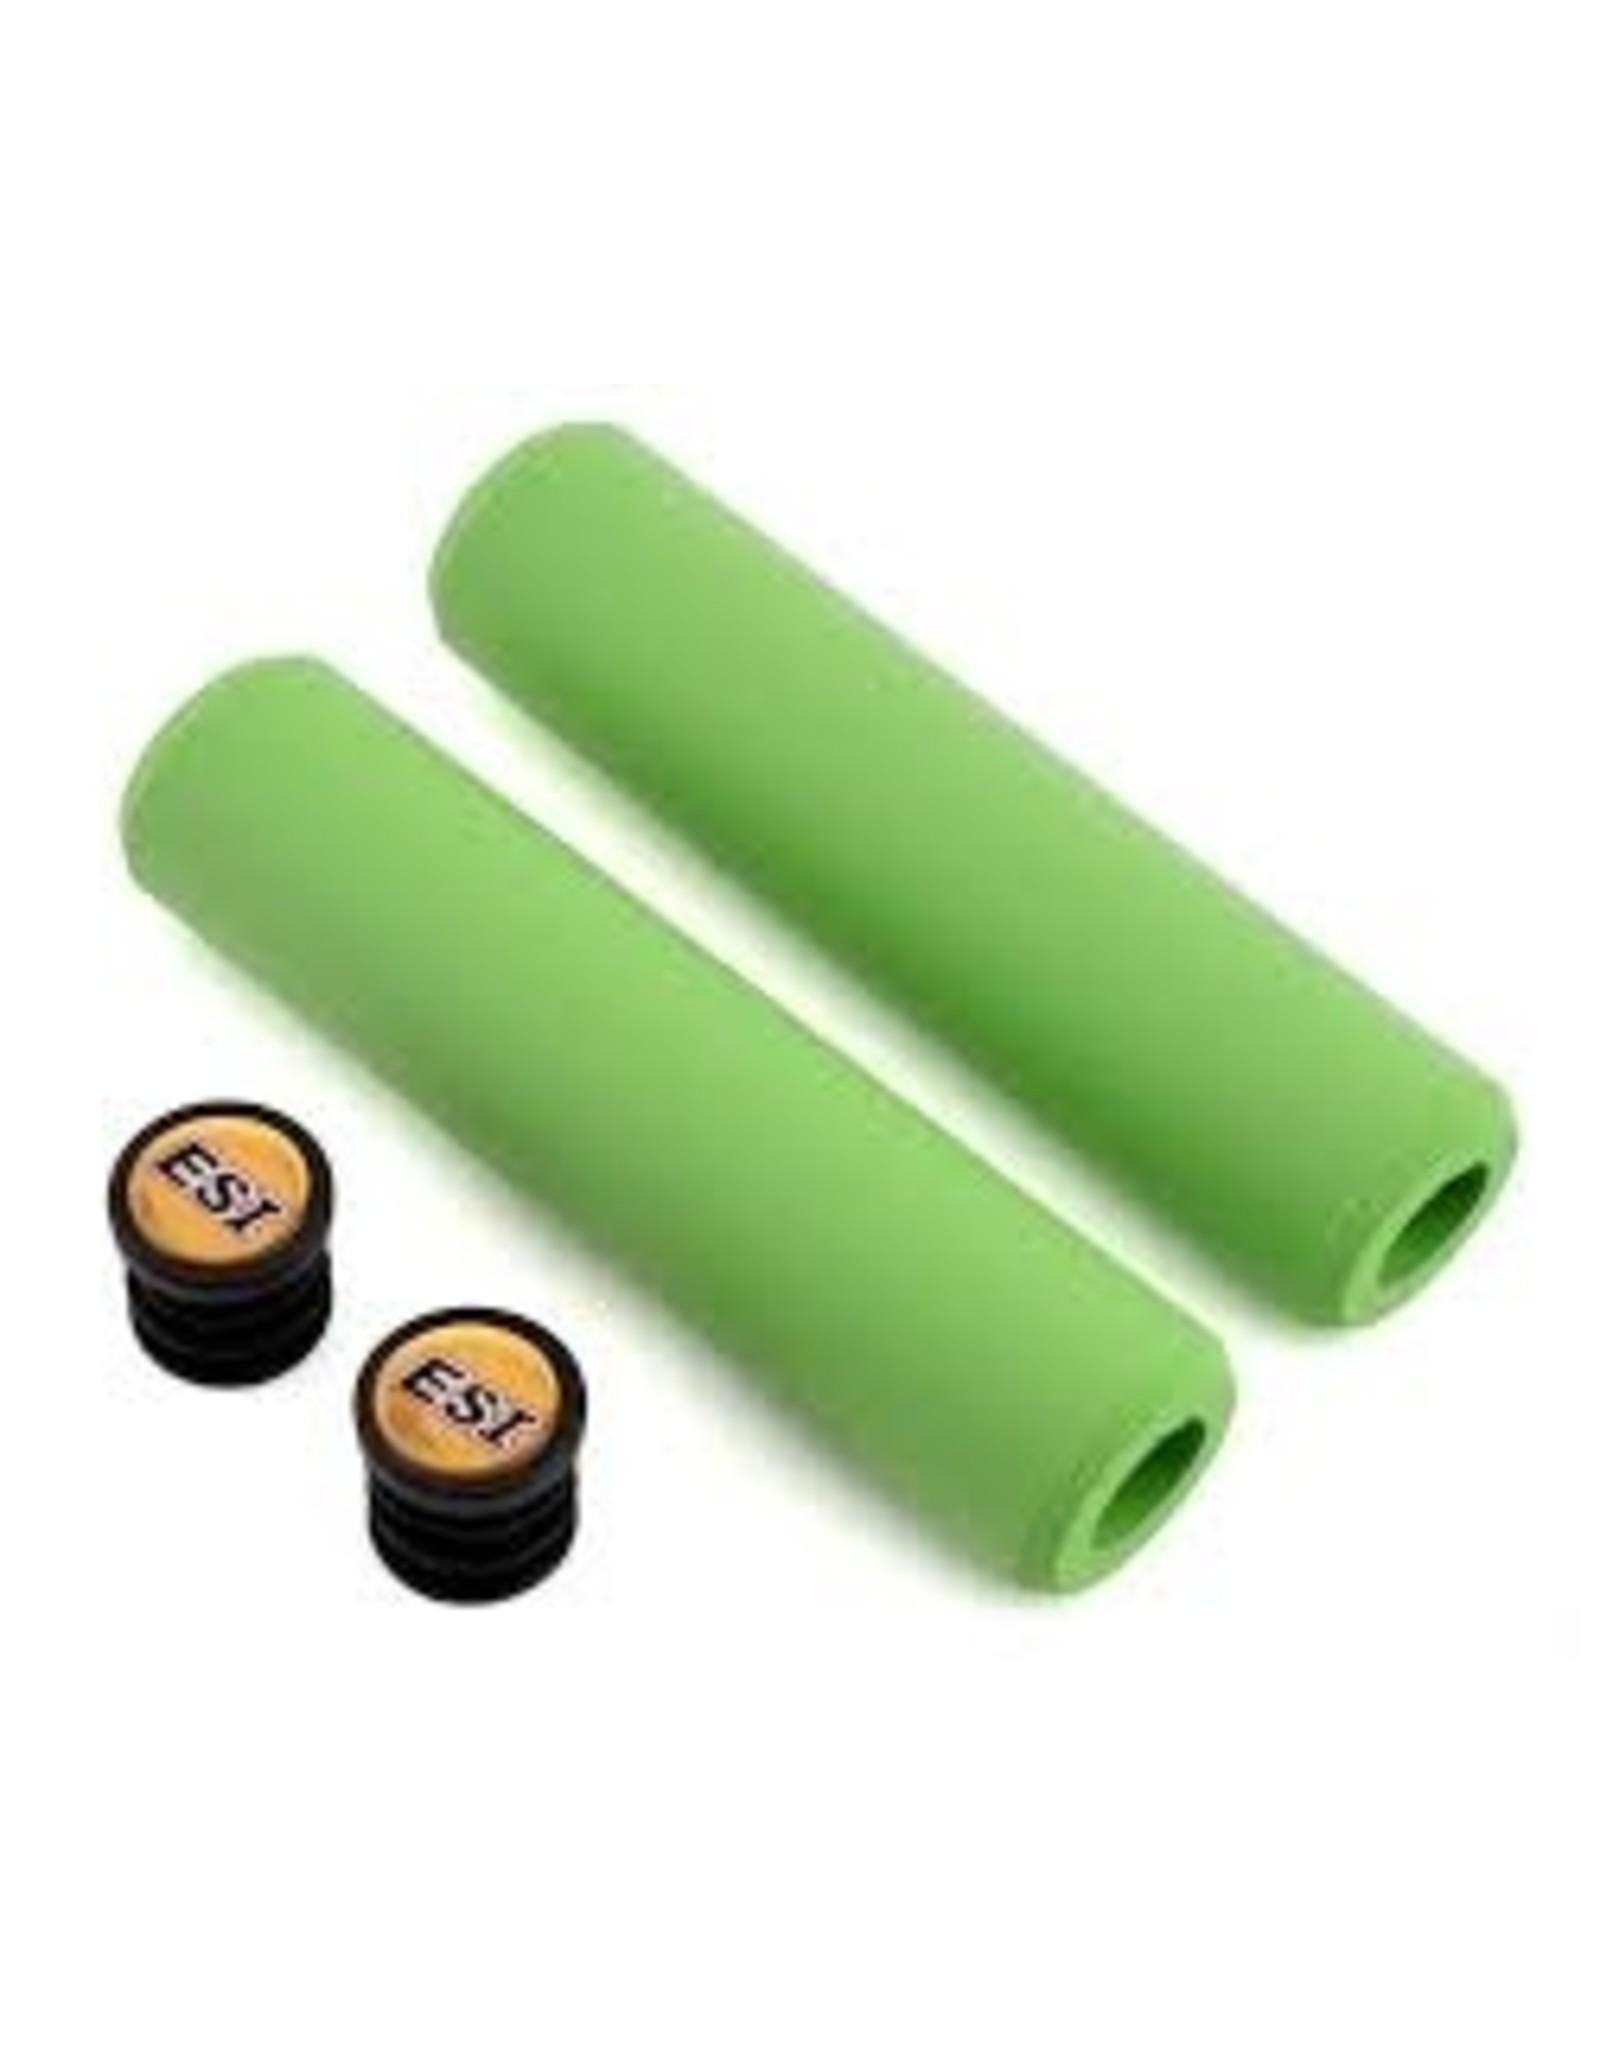 ESI ESI Extra Chunky Grips - Green